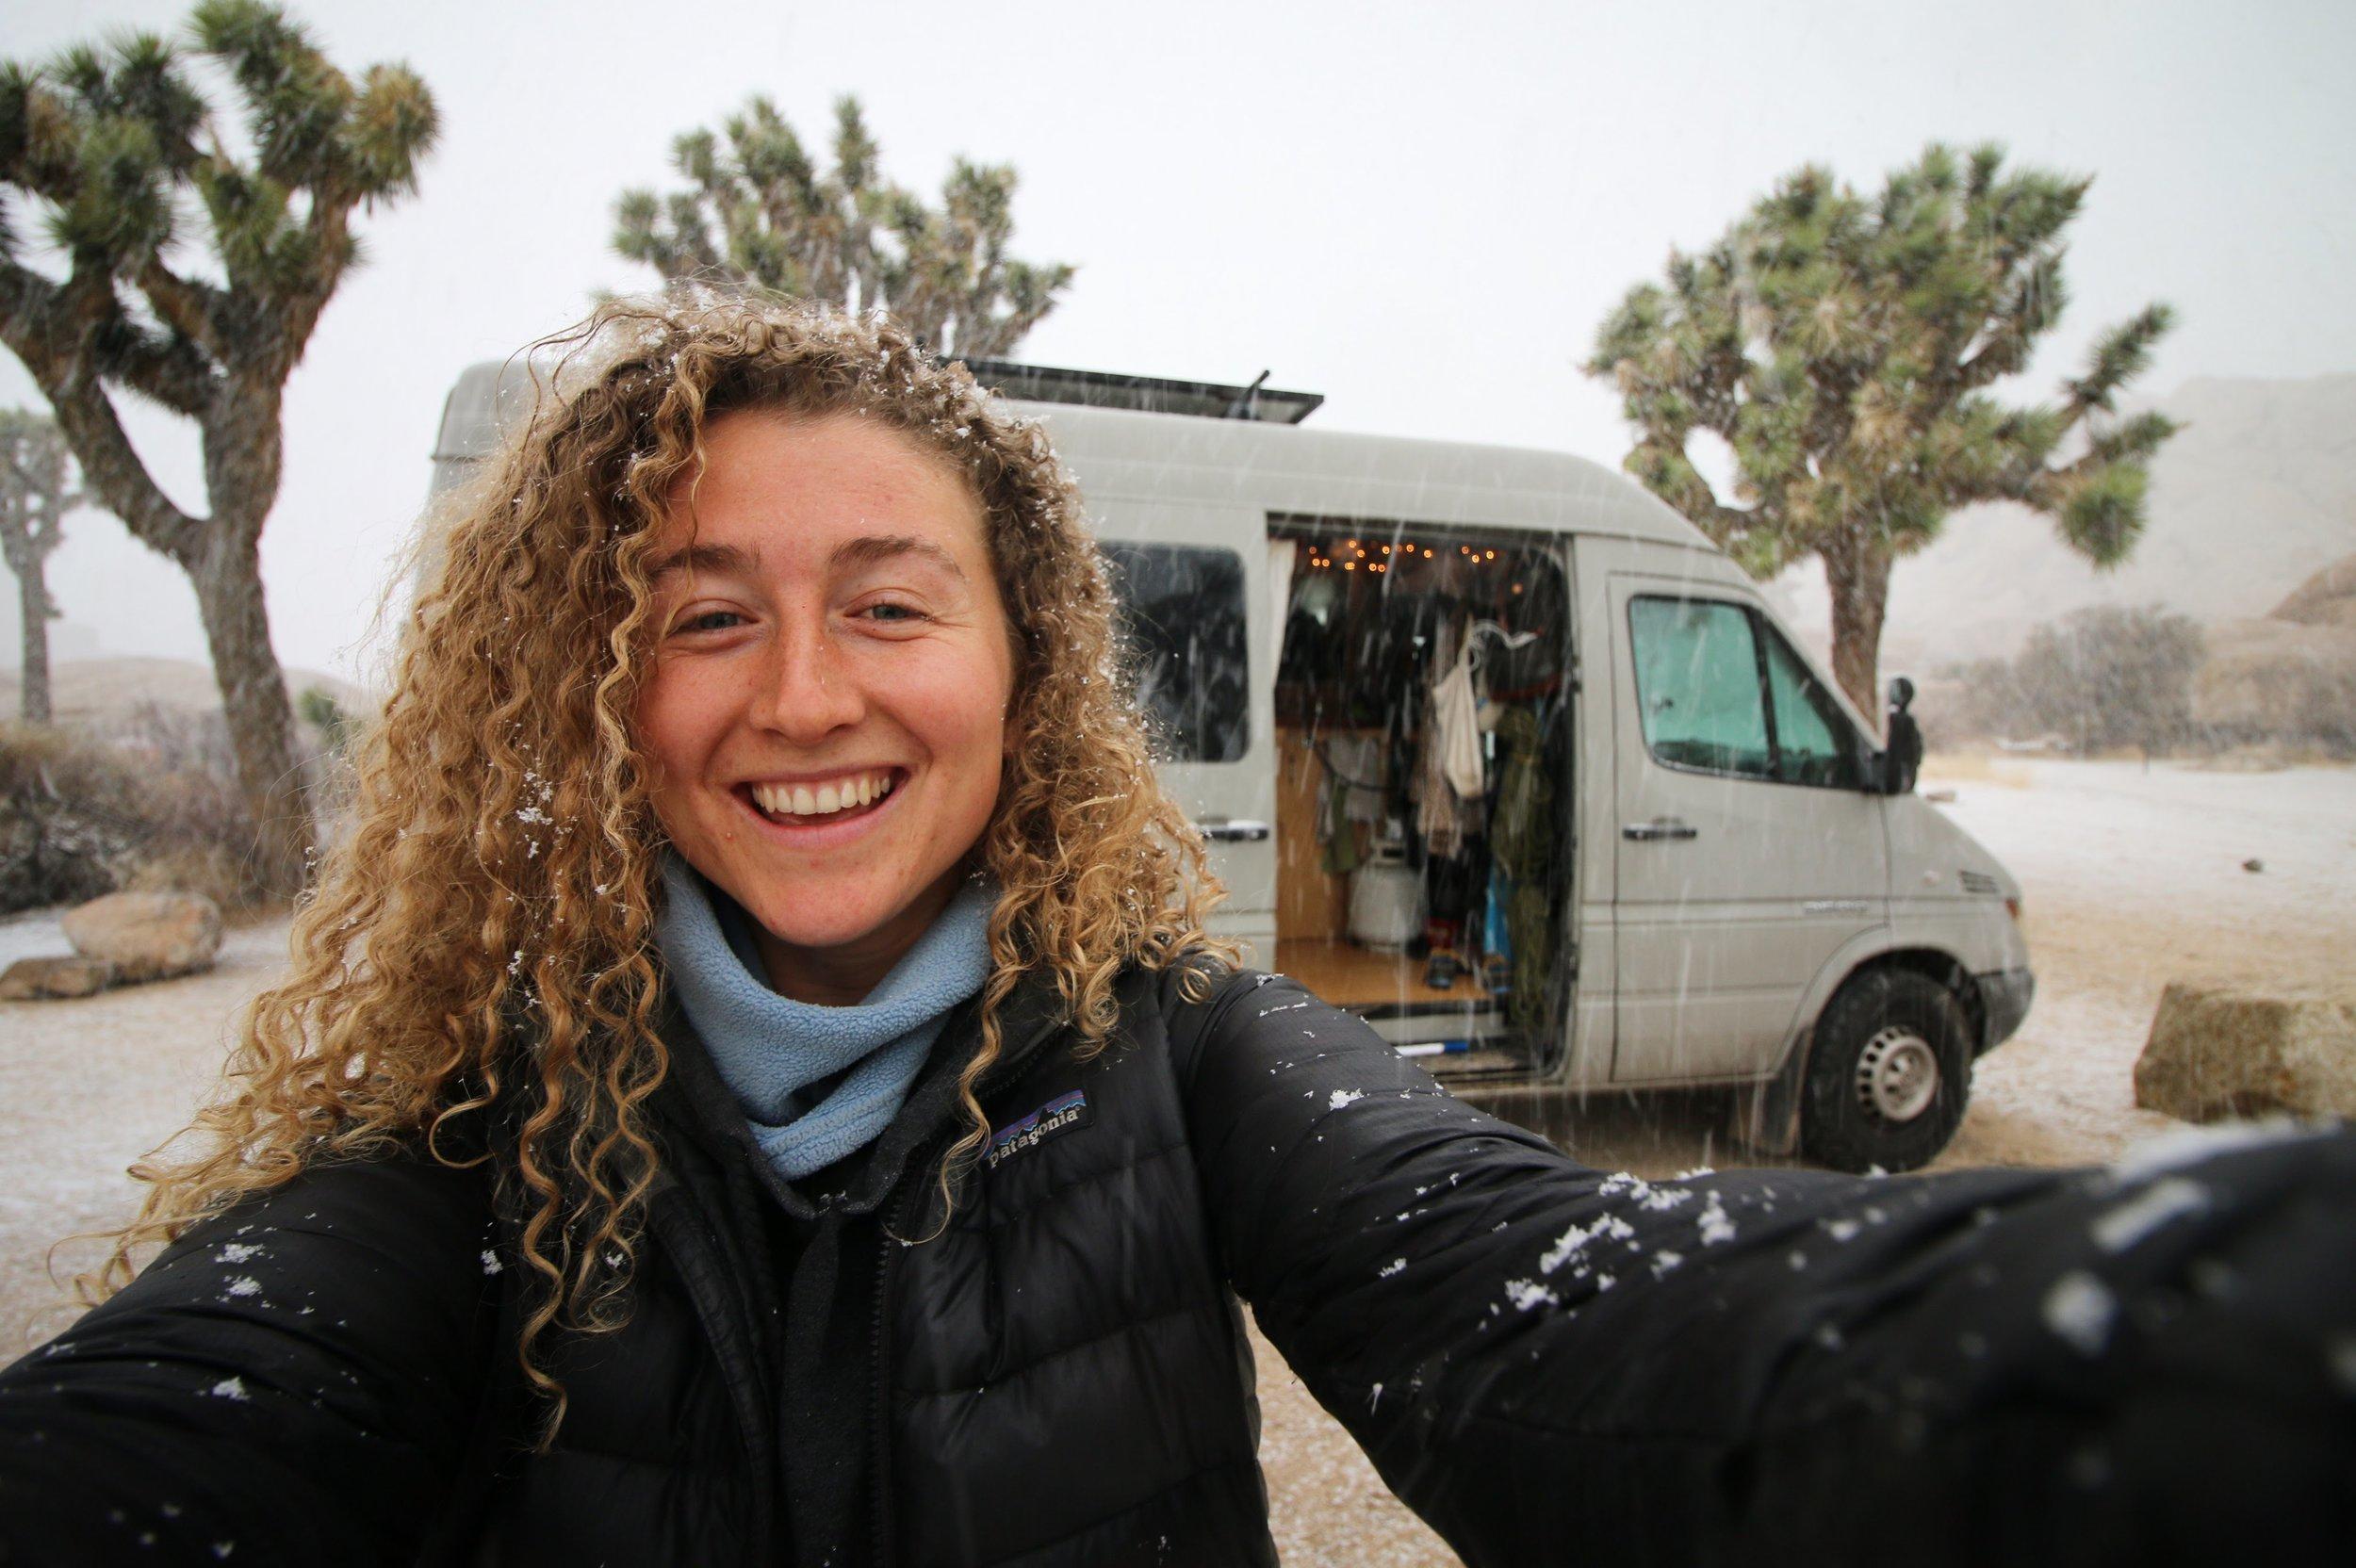 One Chick Travels Selfie with Van in Joshua Tree